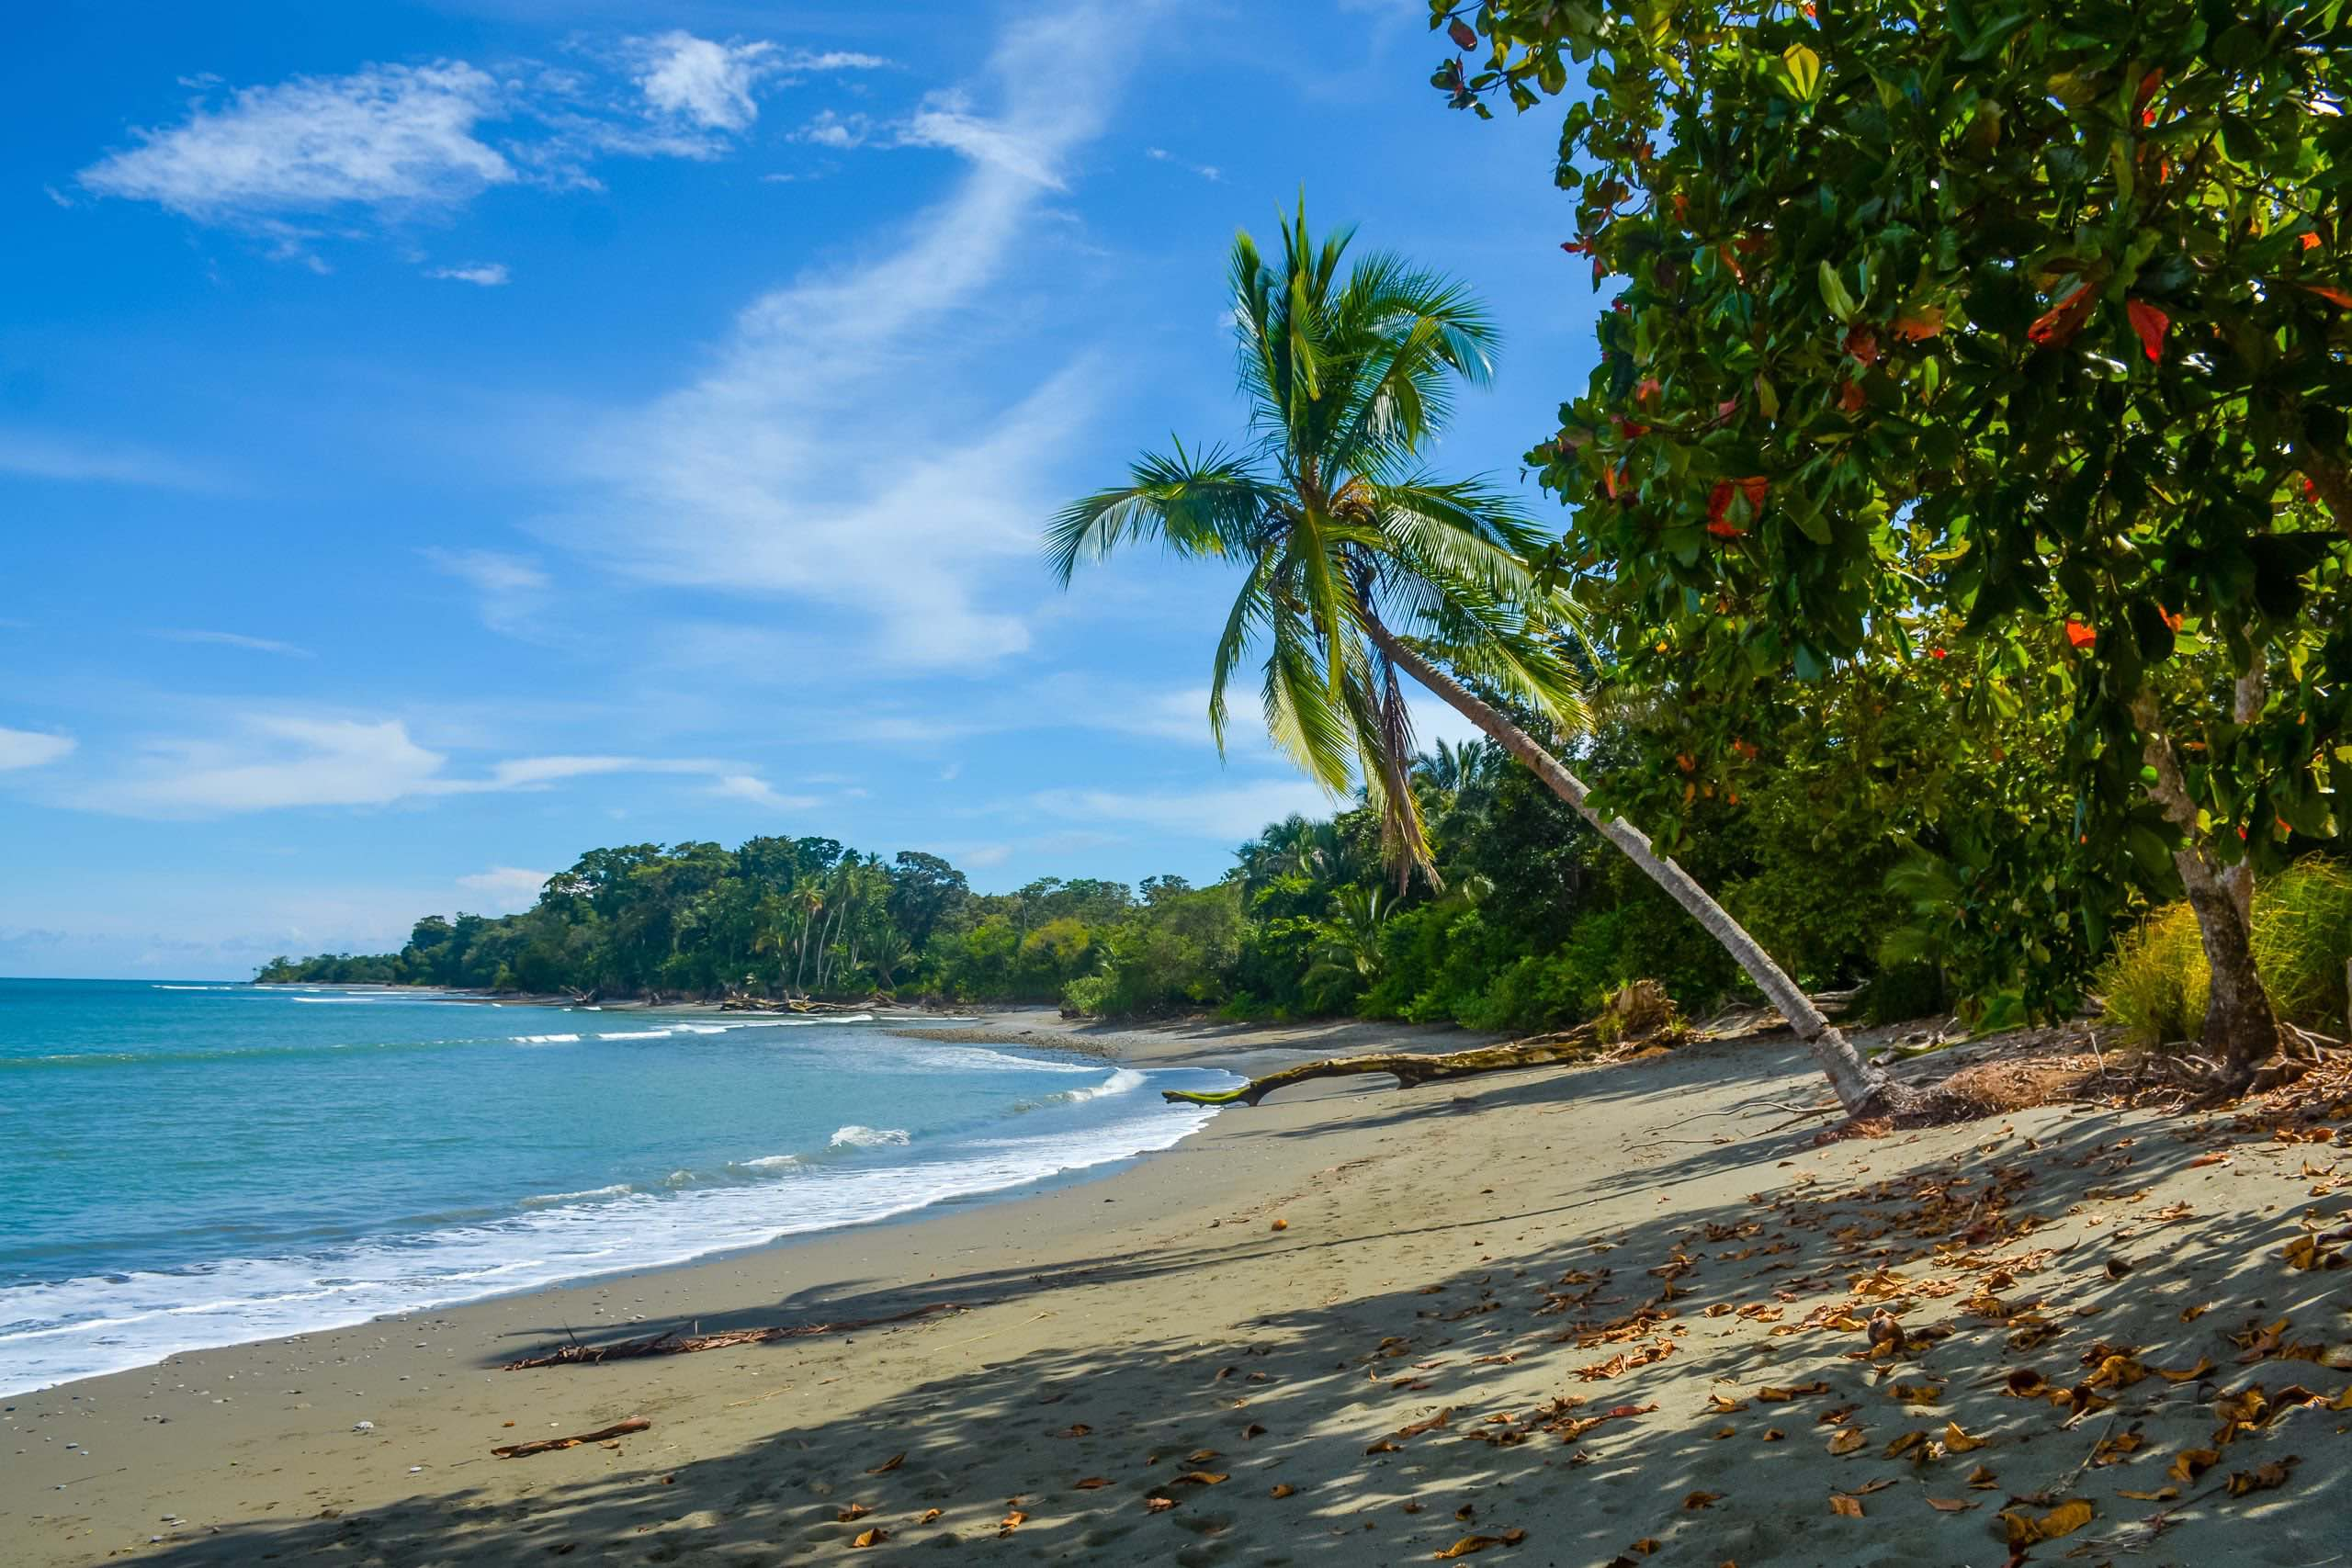 Wellness Retreats in Costa Rica